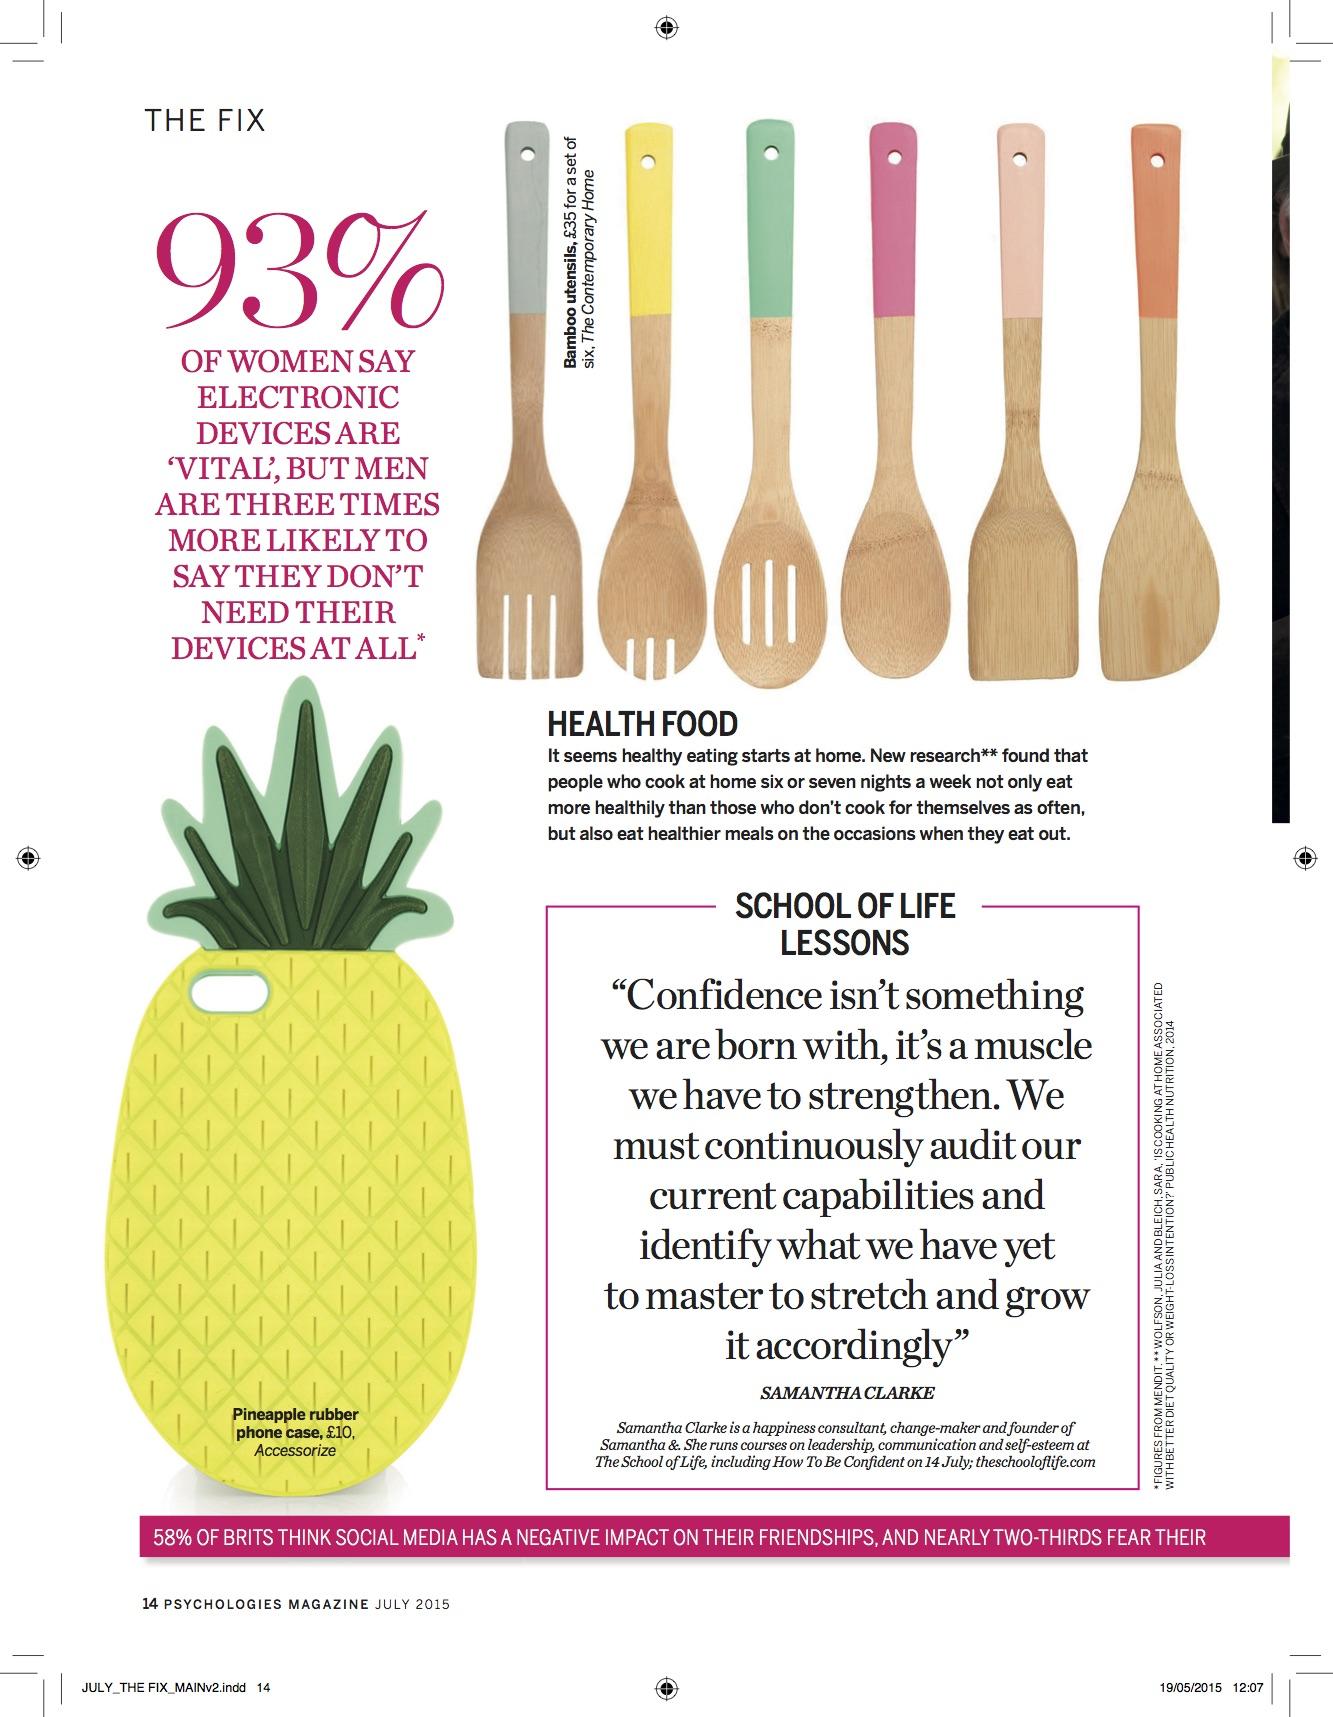 Psychologies Magazine July 2015